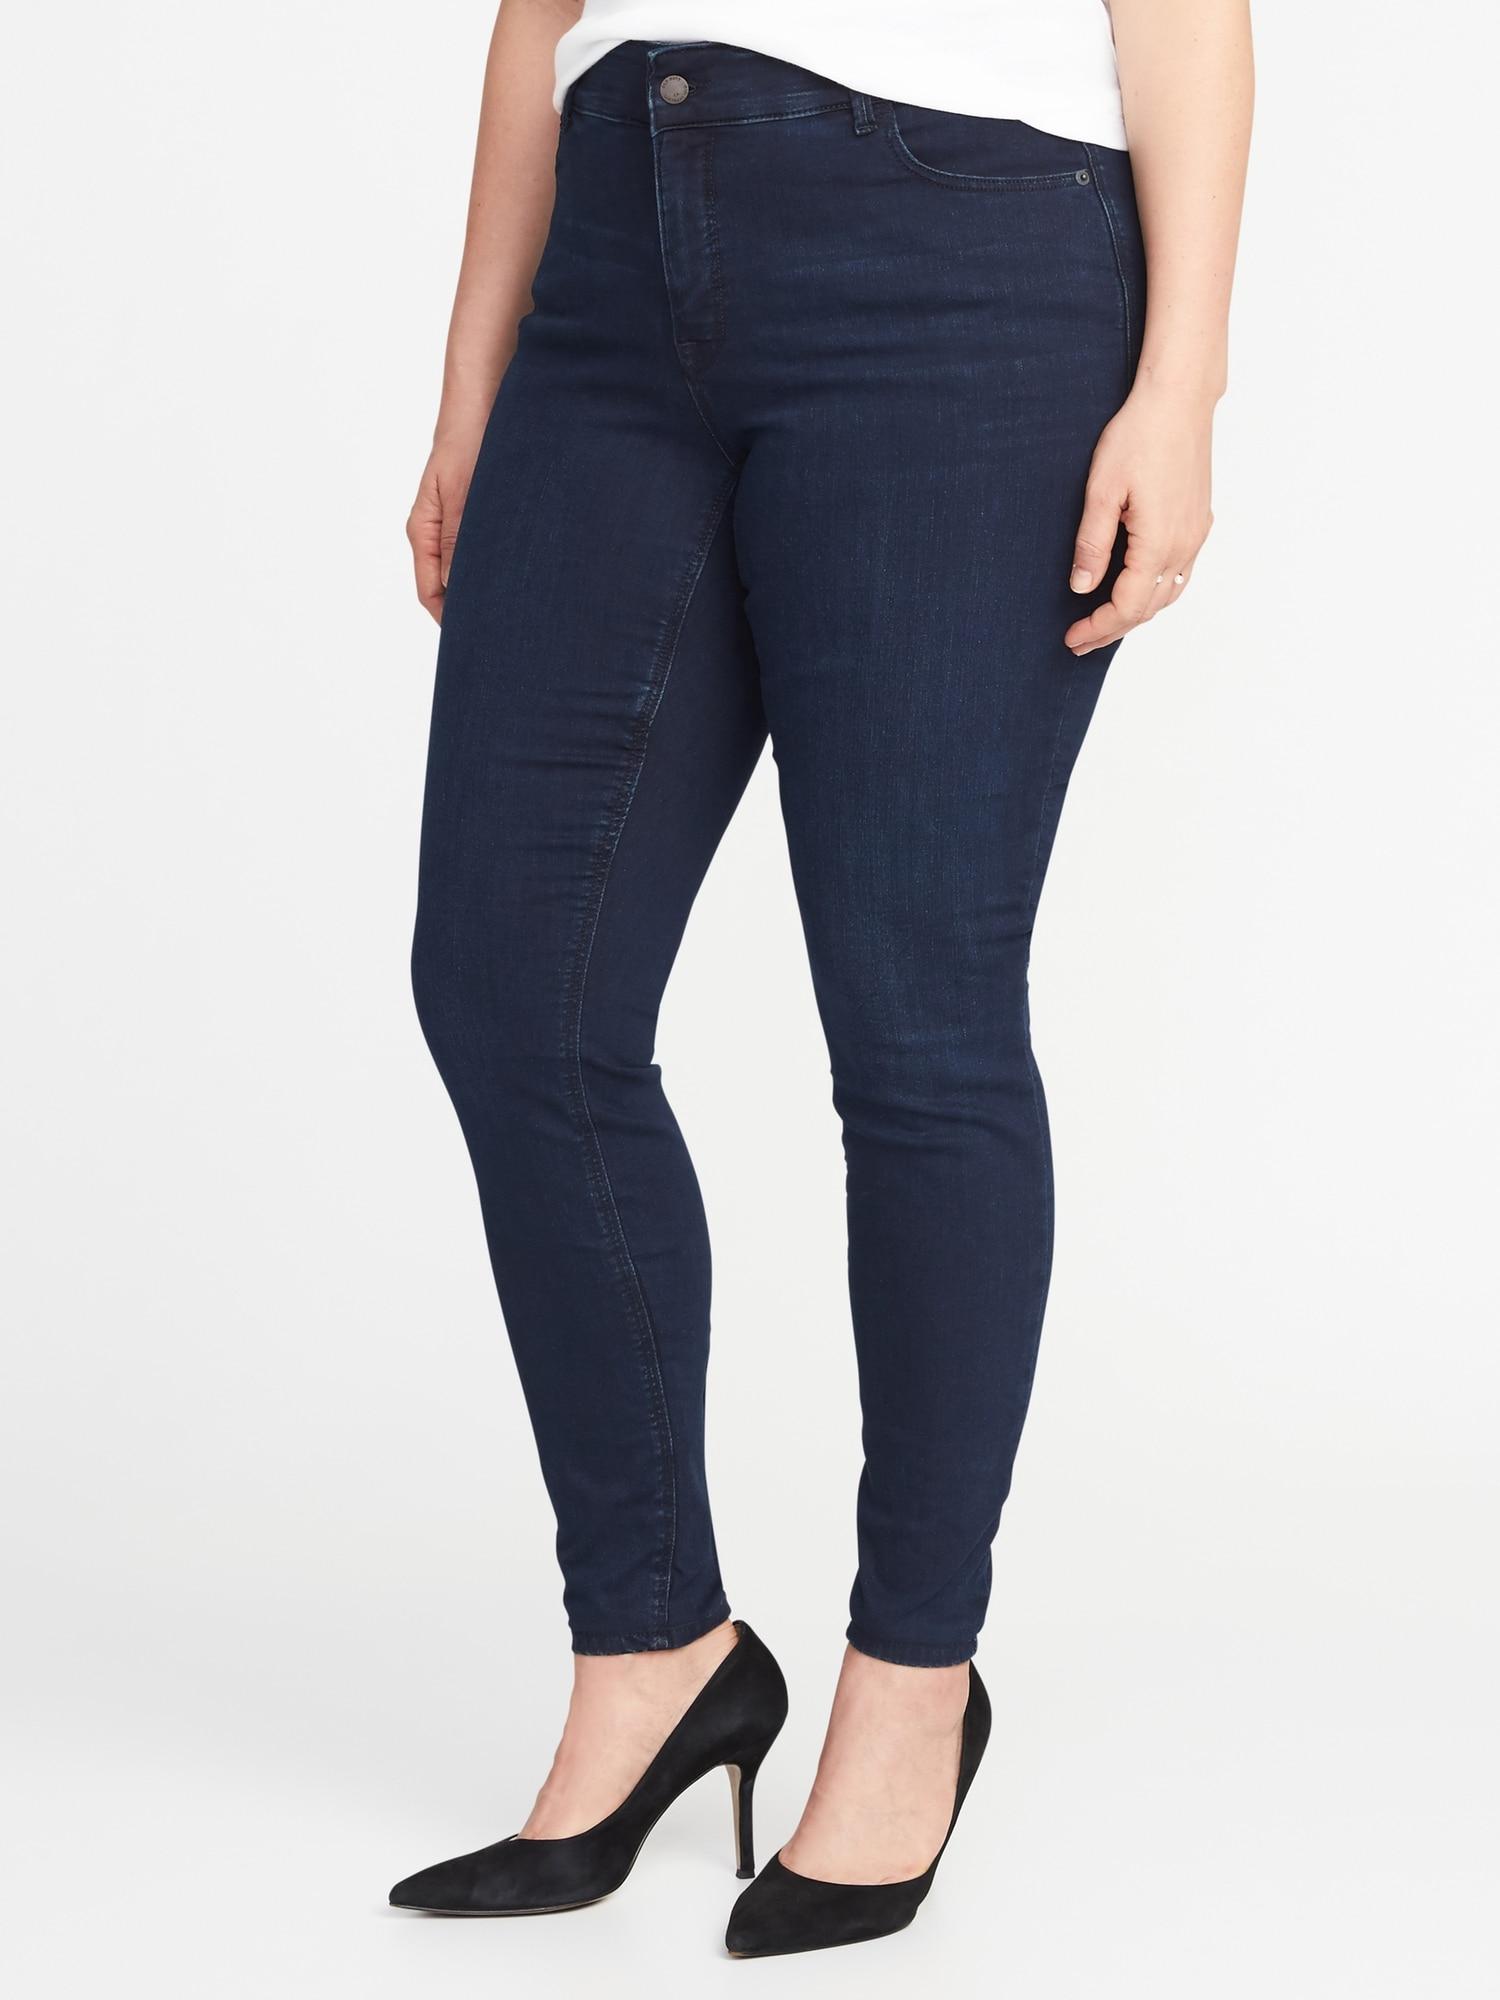 7f1c60d8350f8 High-Rise Secret-Slim Pockets + Waistband Plus-Size Rockstar Jeans ...